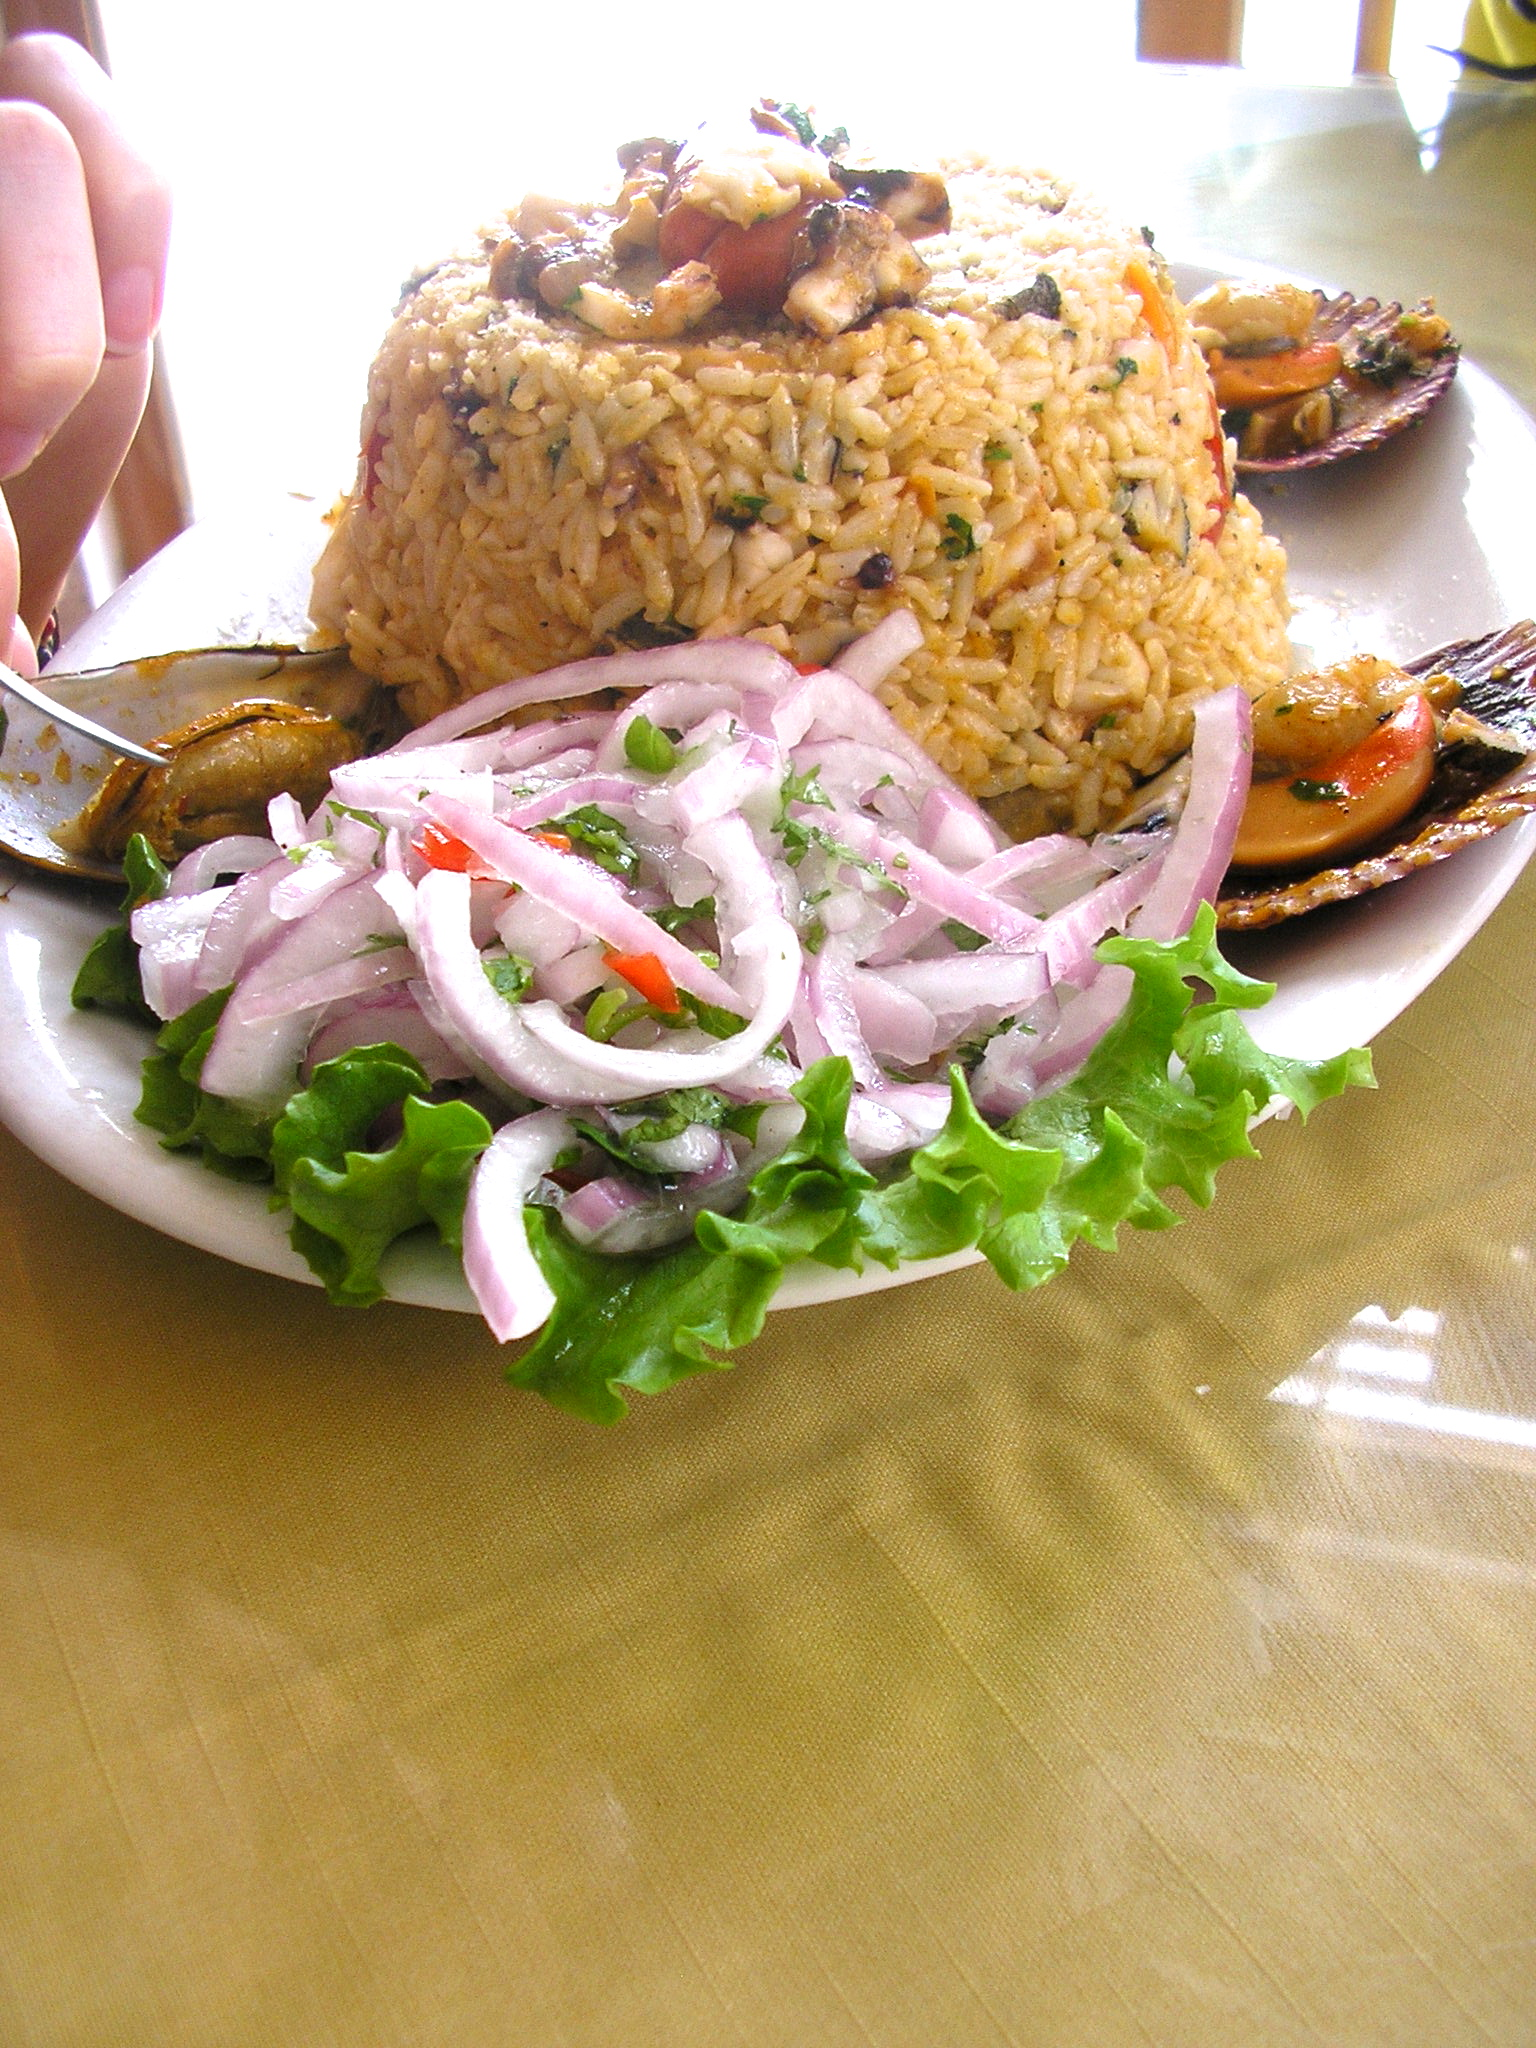 A seafood dish. Photo © Jillian Regan 2011